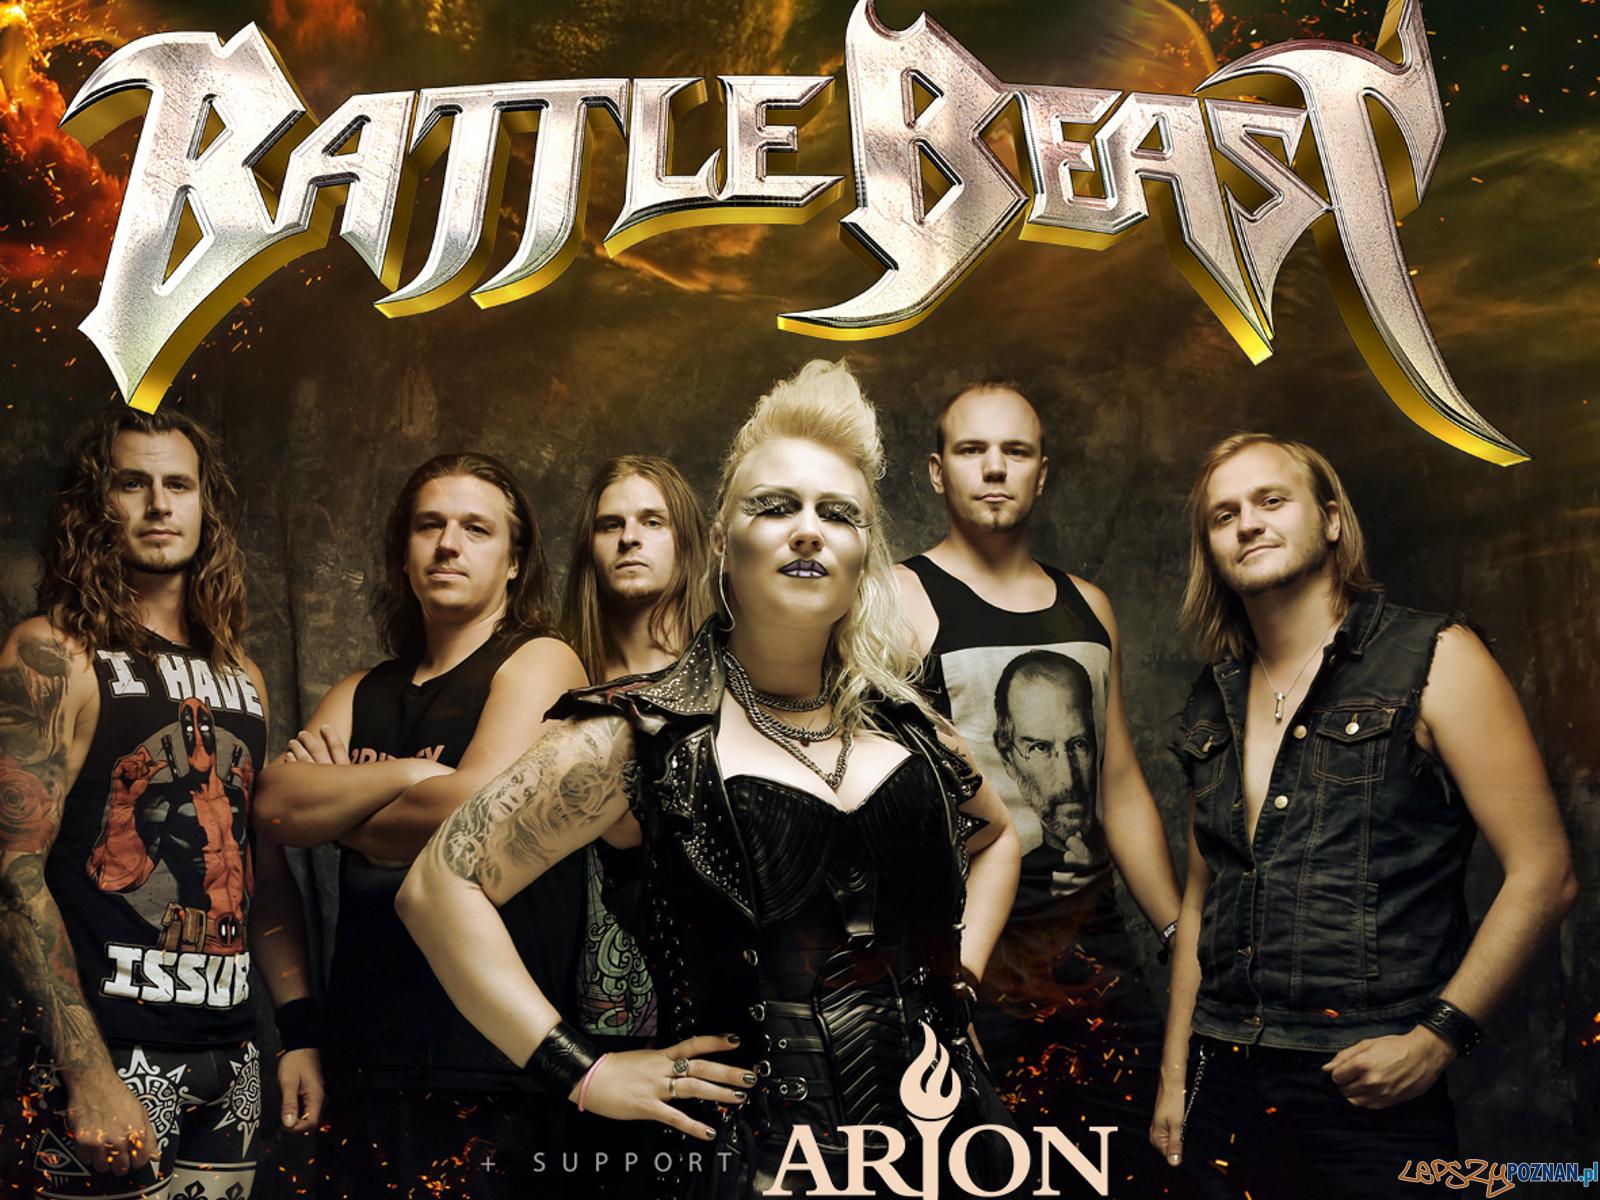 Battle Beast  Foto: Knock Out Productions / materiały prasowe